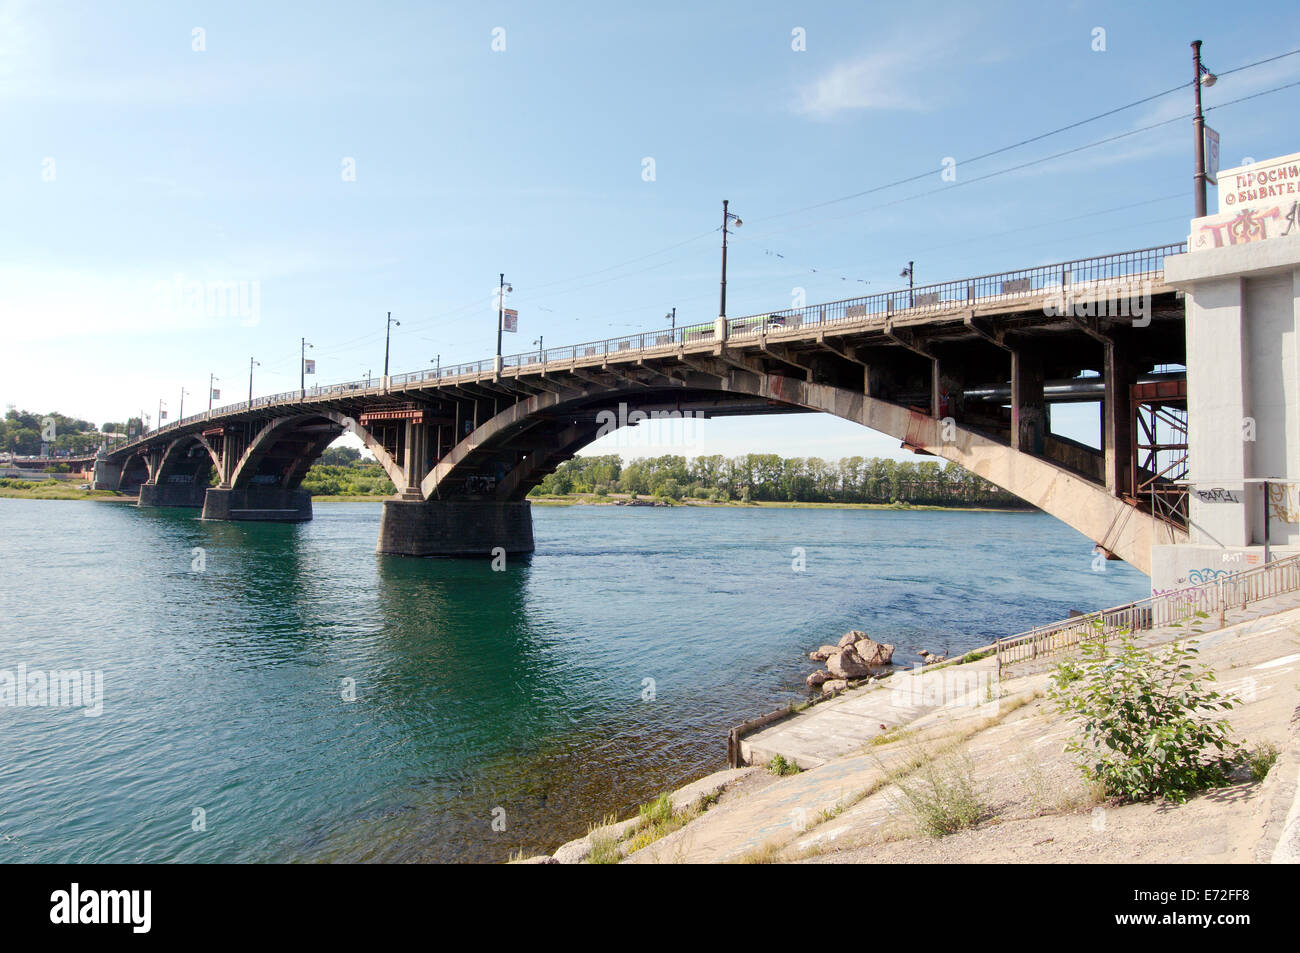 Bridge across the Irkut River in historic city center. Irkutsk, Siberia, Russian Federation - Stock Image